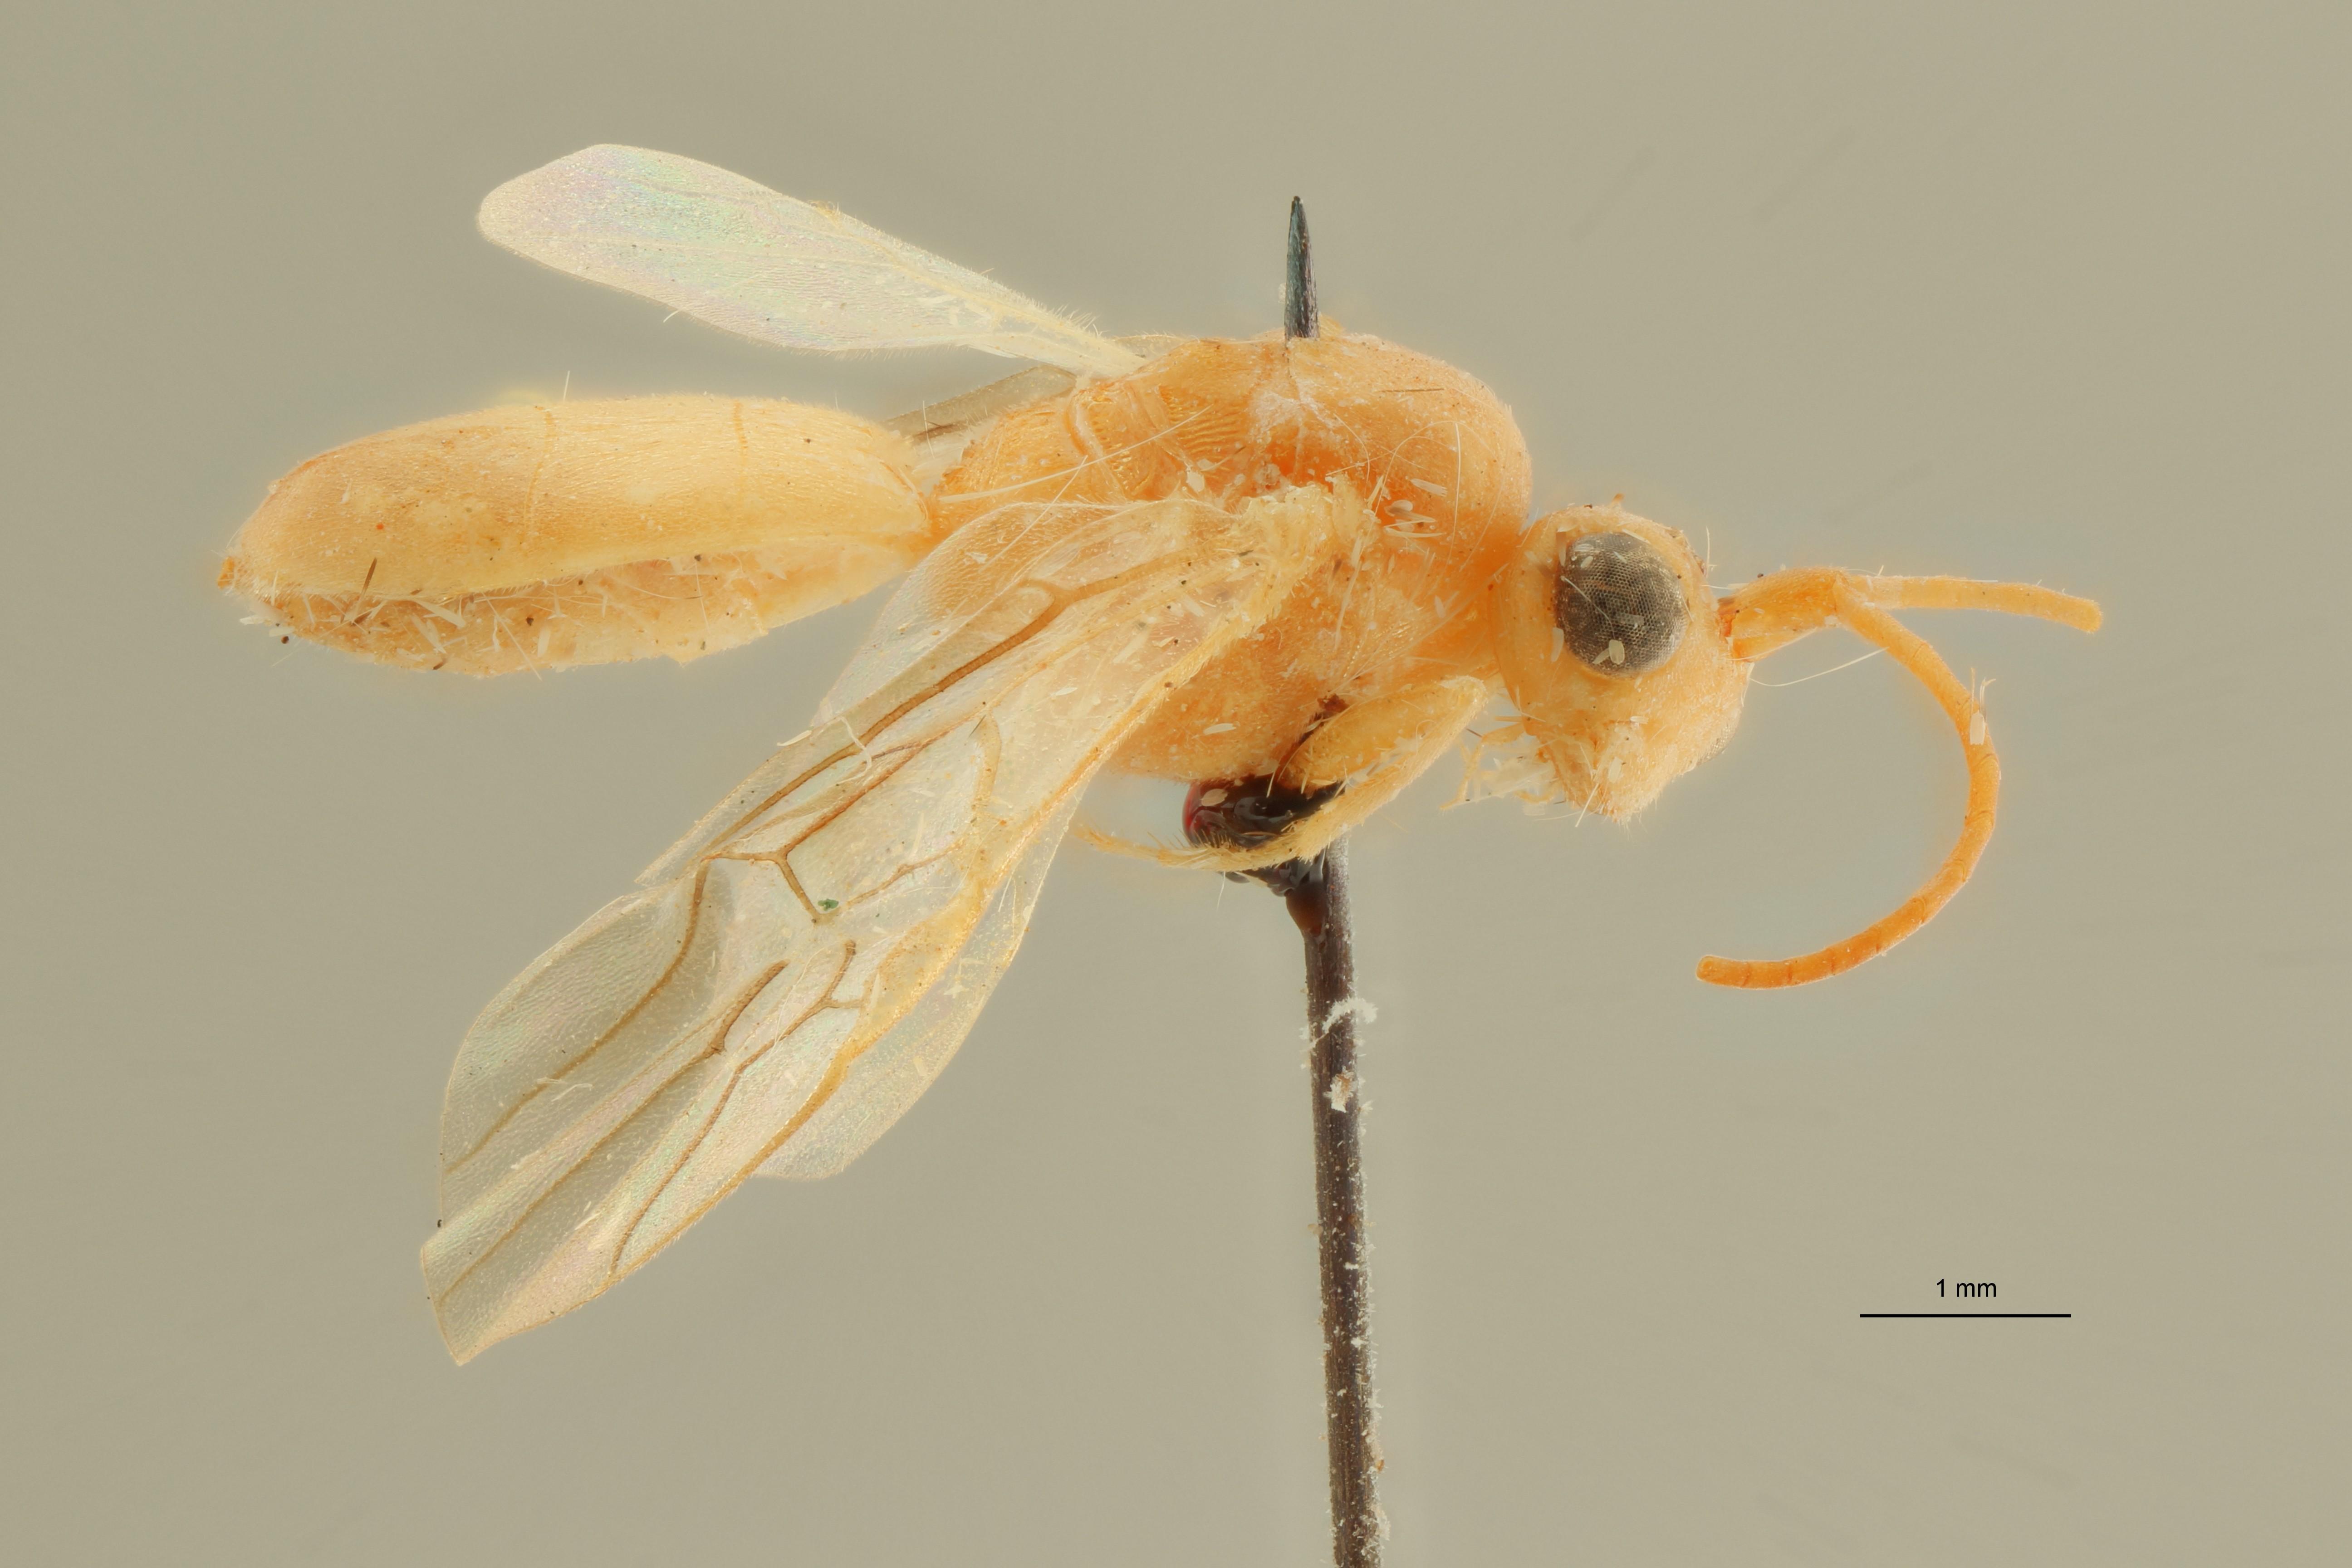 Phanerotoma robusta ht L ZS PMax Scaled.jpeg